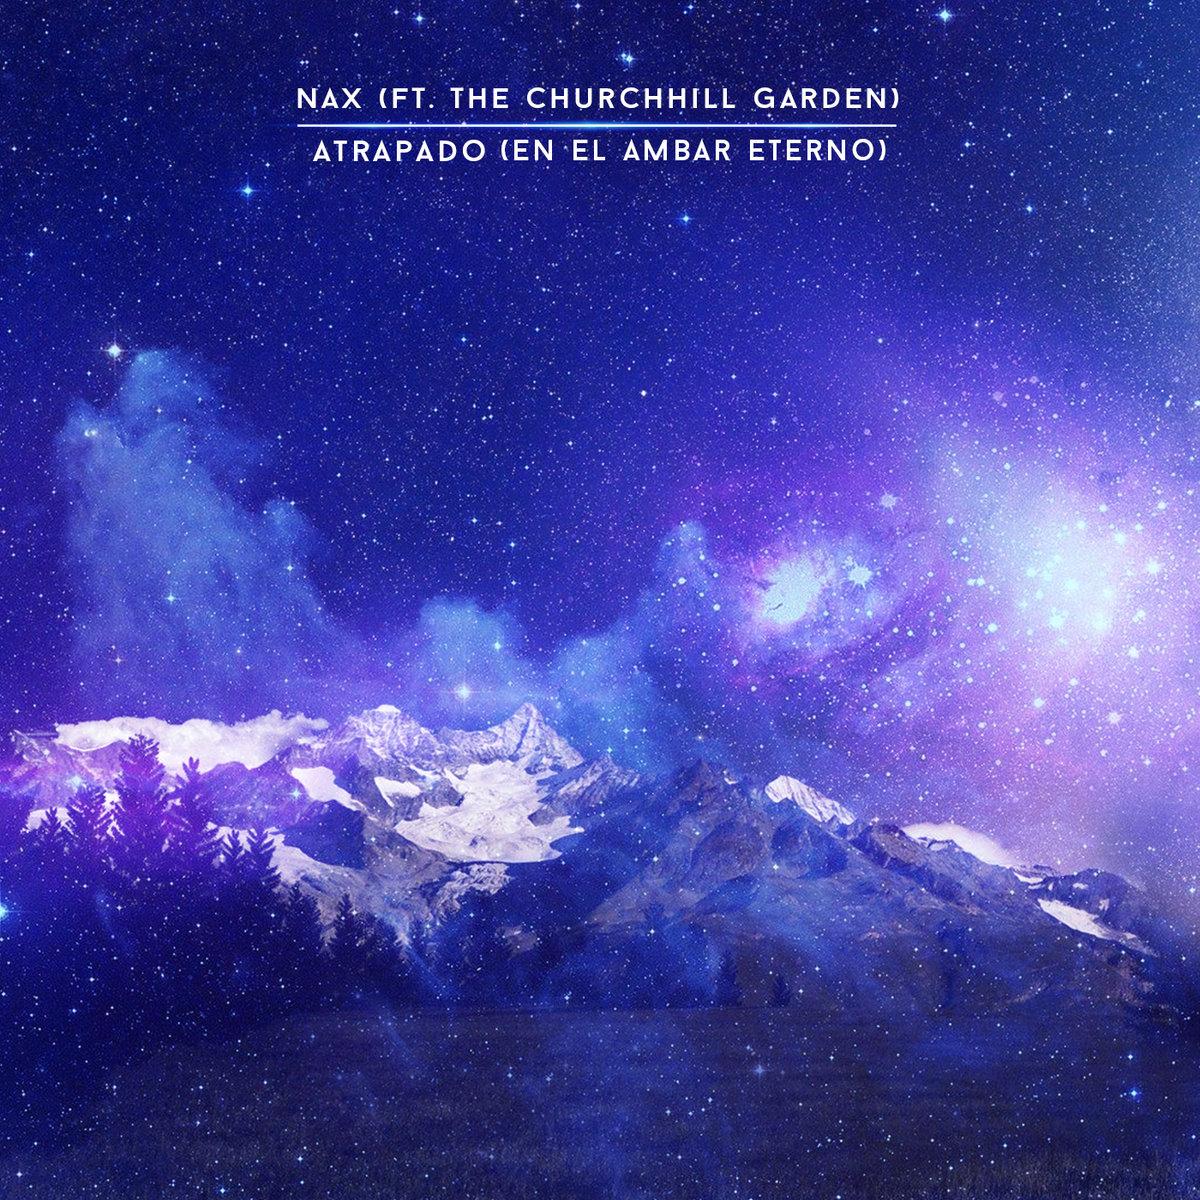 Nax/The Churchill Garden single 'Atrapado (En El Ambar Eterno) Artwork